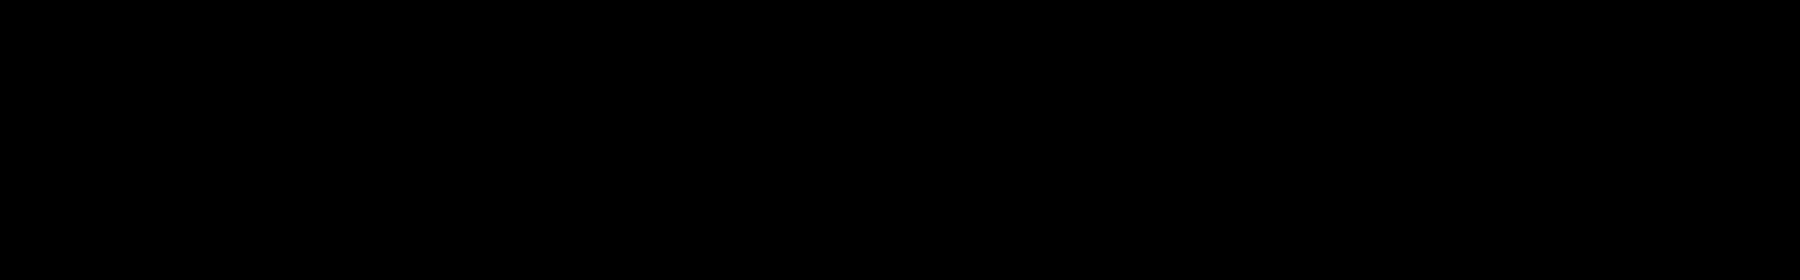 Trap Game audio waveform